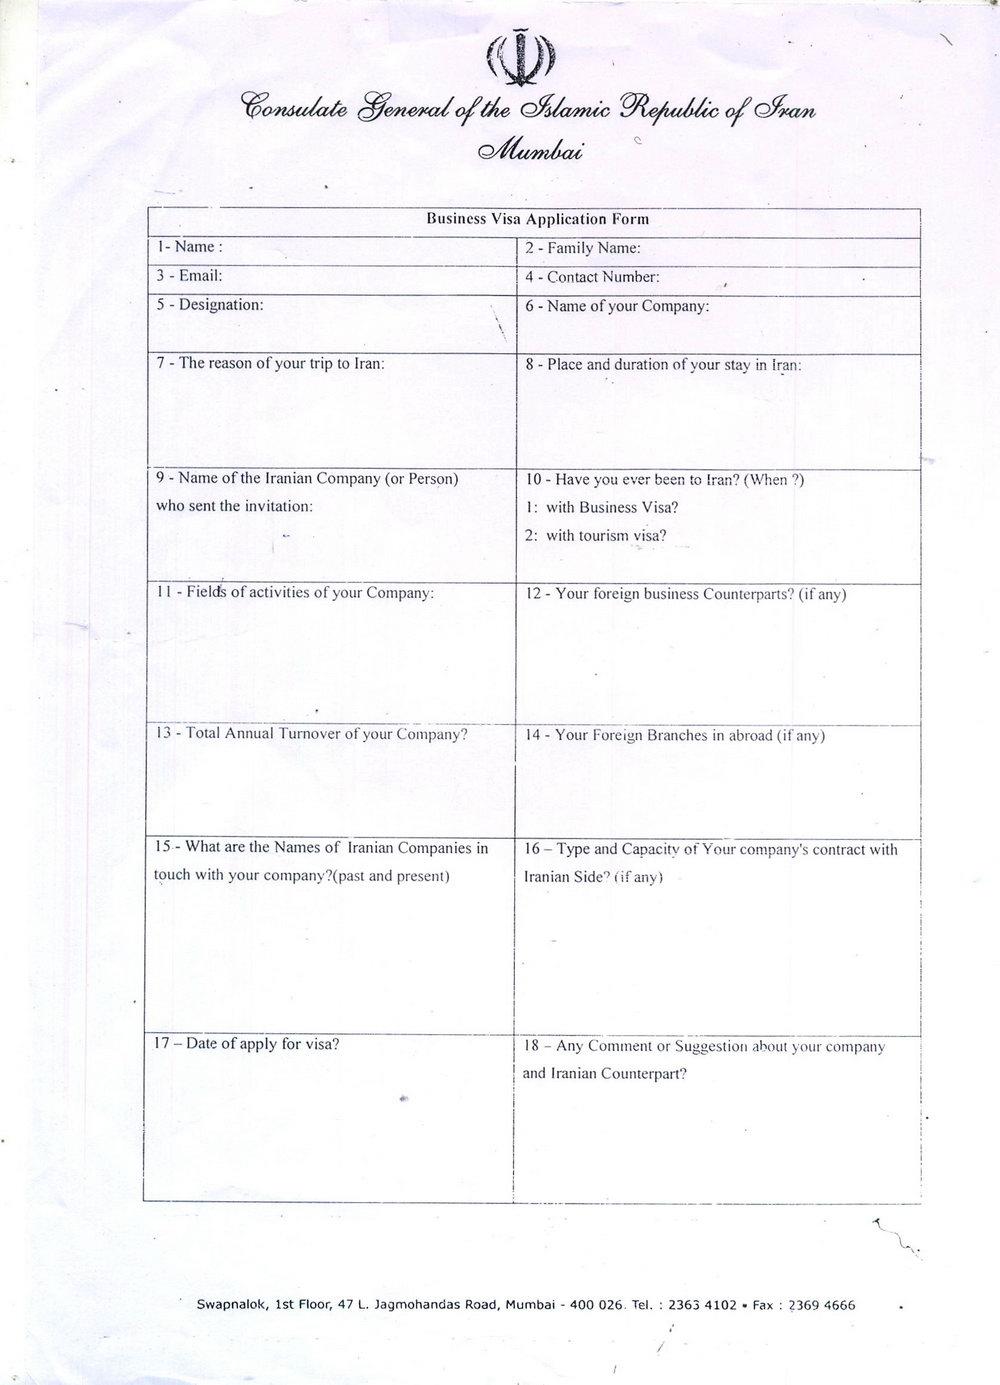 Australian Visa Application Form 1419 Download